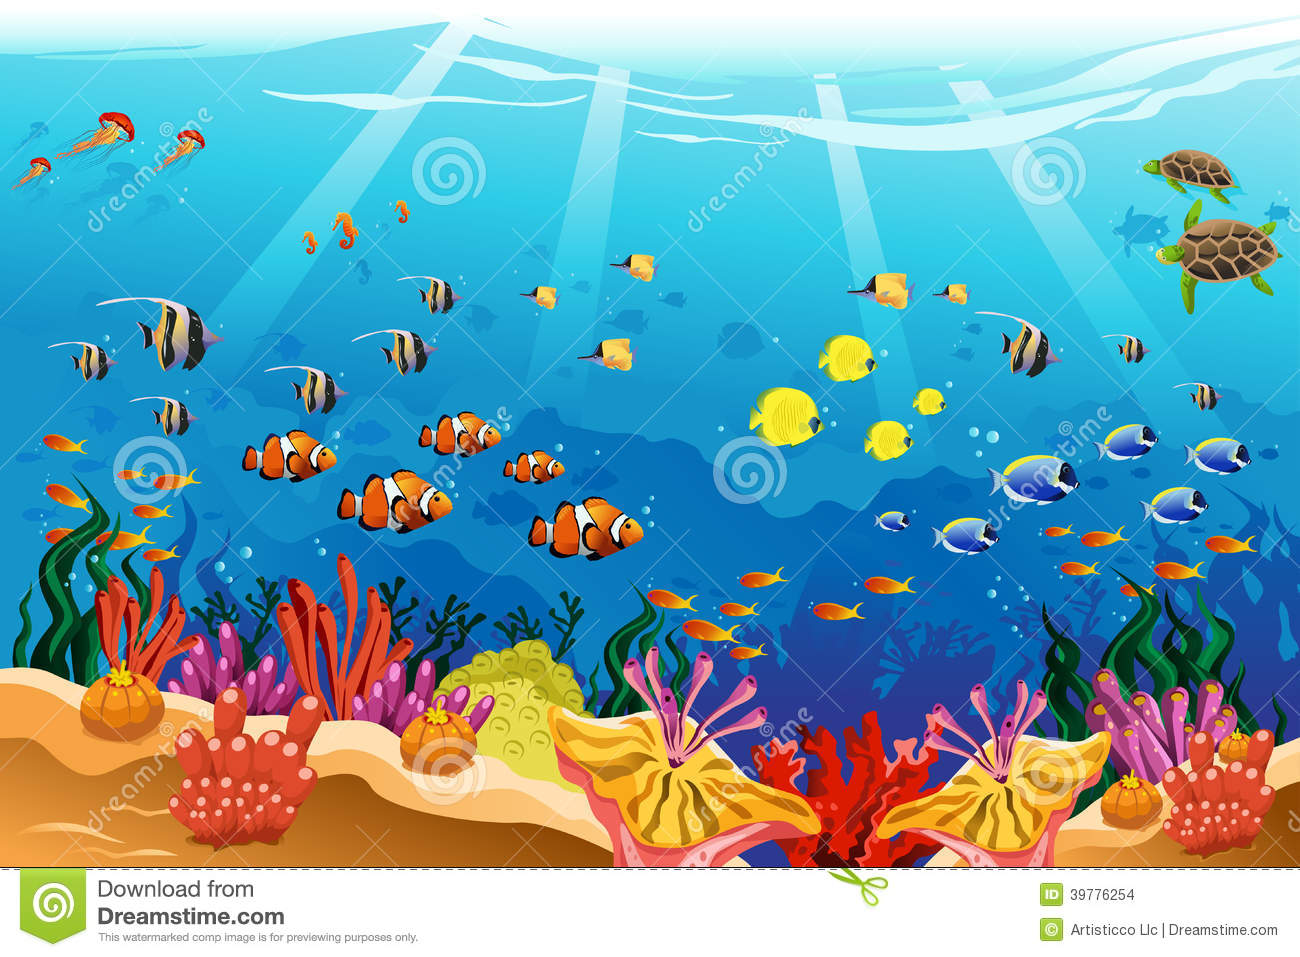 Scenery clipart ocean theme #6